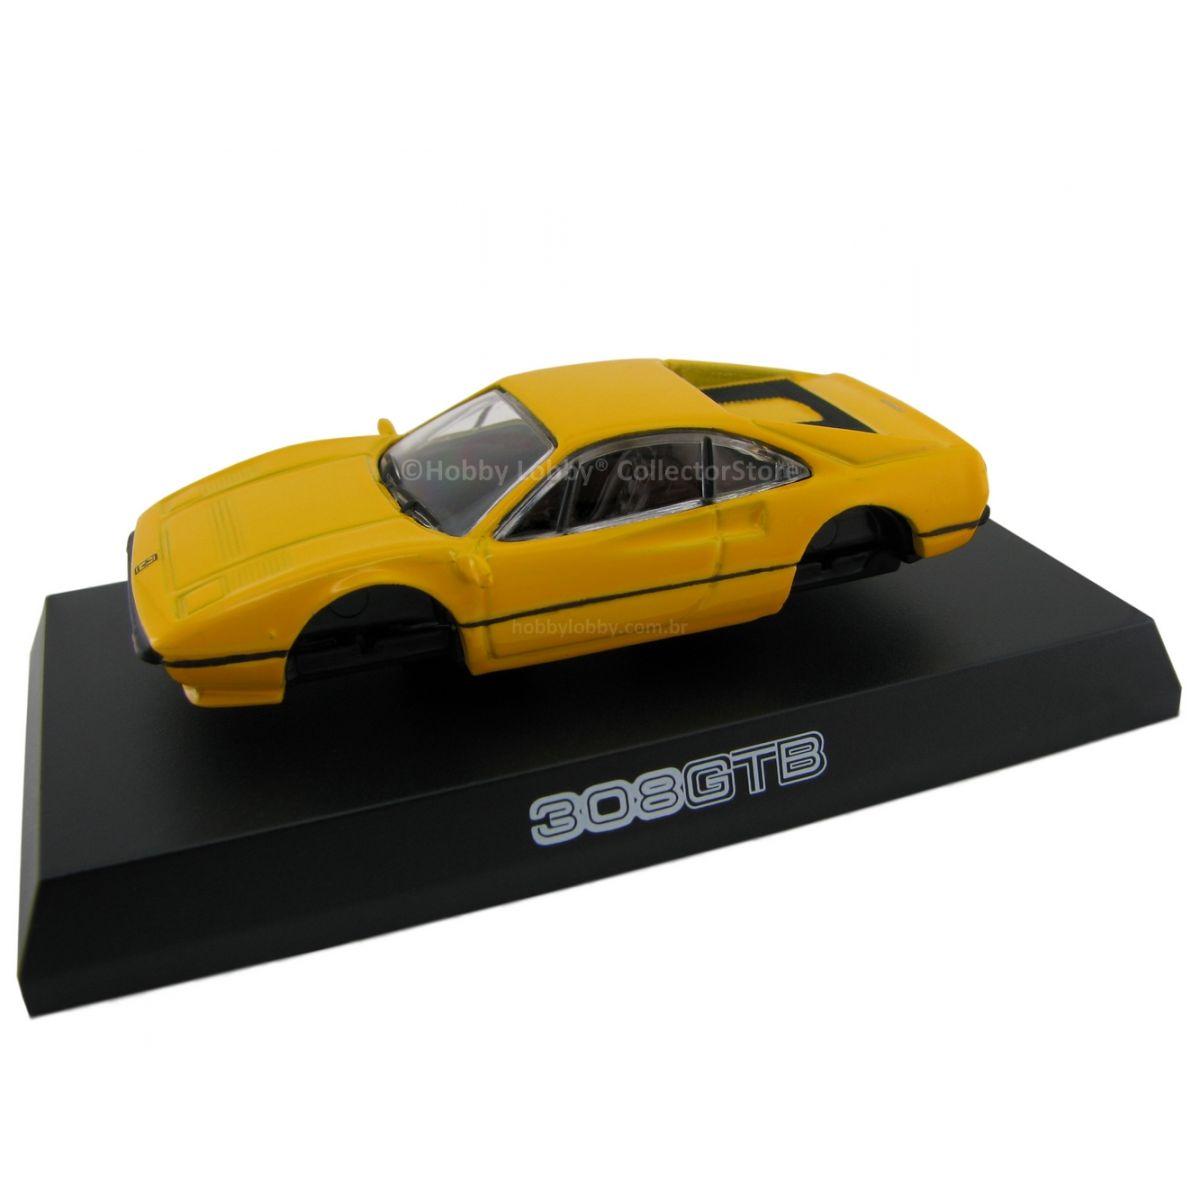 Kyosho - Ferrari Minicar Collection II - Ferrari 308 GTB (amarela)  - Hobby Lobby CollectorStore